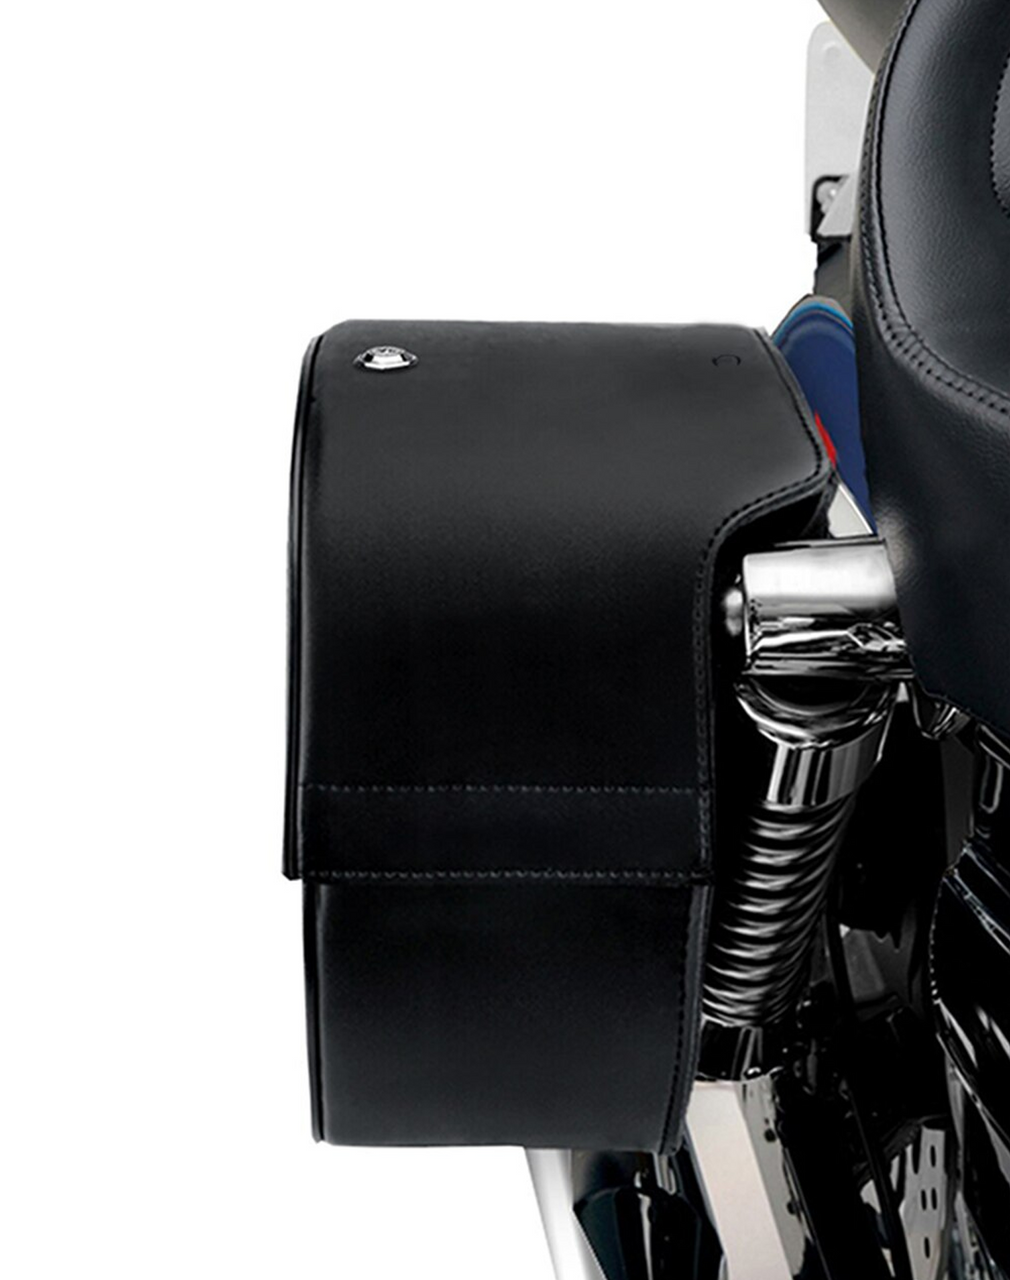 Honda VTX 1300 Retro Charger Side Pocket With Shock Cutout Motorcycle Saddlebags Shock Cutout View